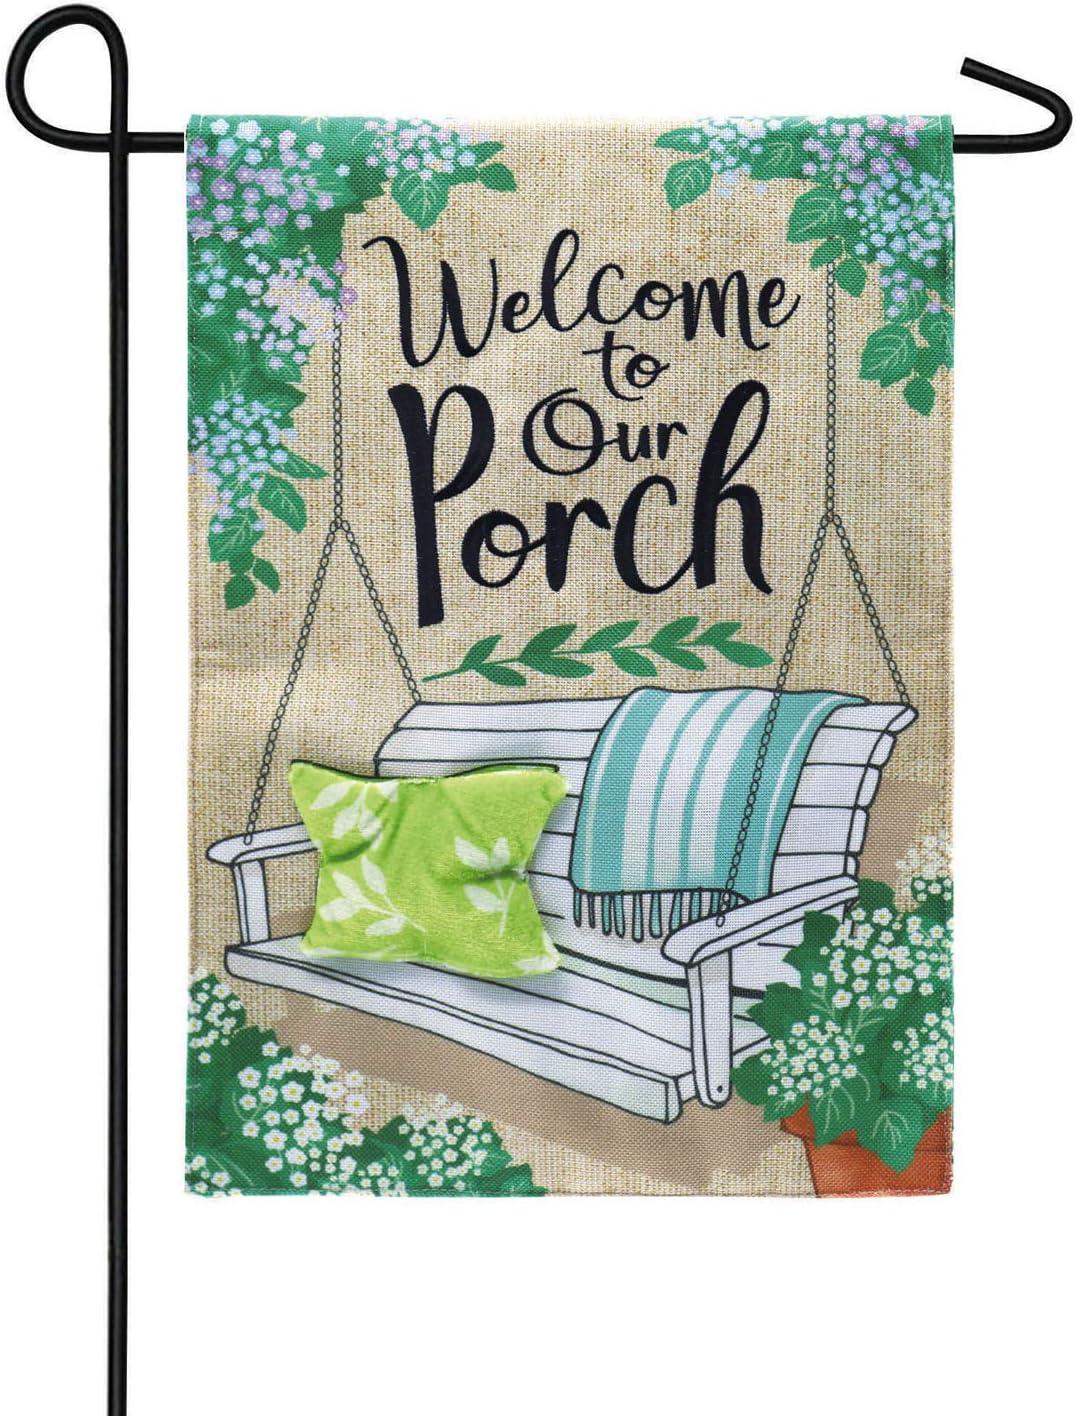 Porch Swing Welcome Garden Burlap Flag - x 1 Trust 13 Inches Regular store 18